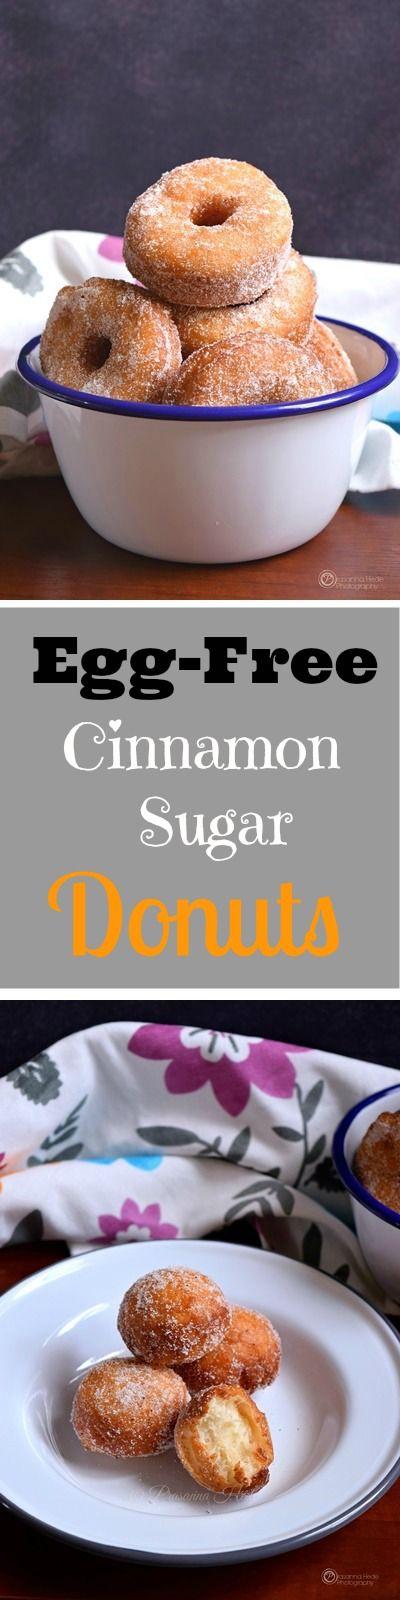 Egg-free Recipe of Cinnamon Sugar Donuts! Perfect recipe for little one's. #easyrecipe #recipes #eggless #homemade #yum